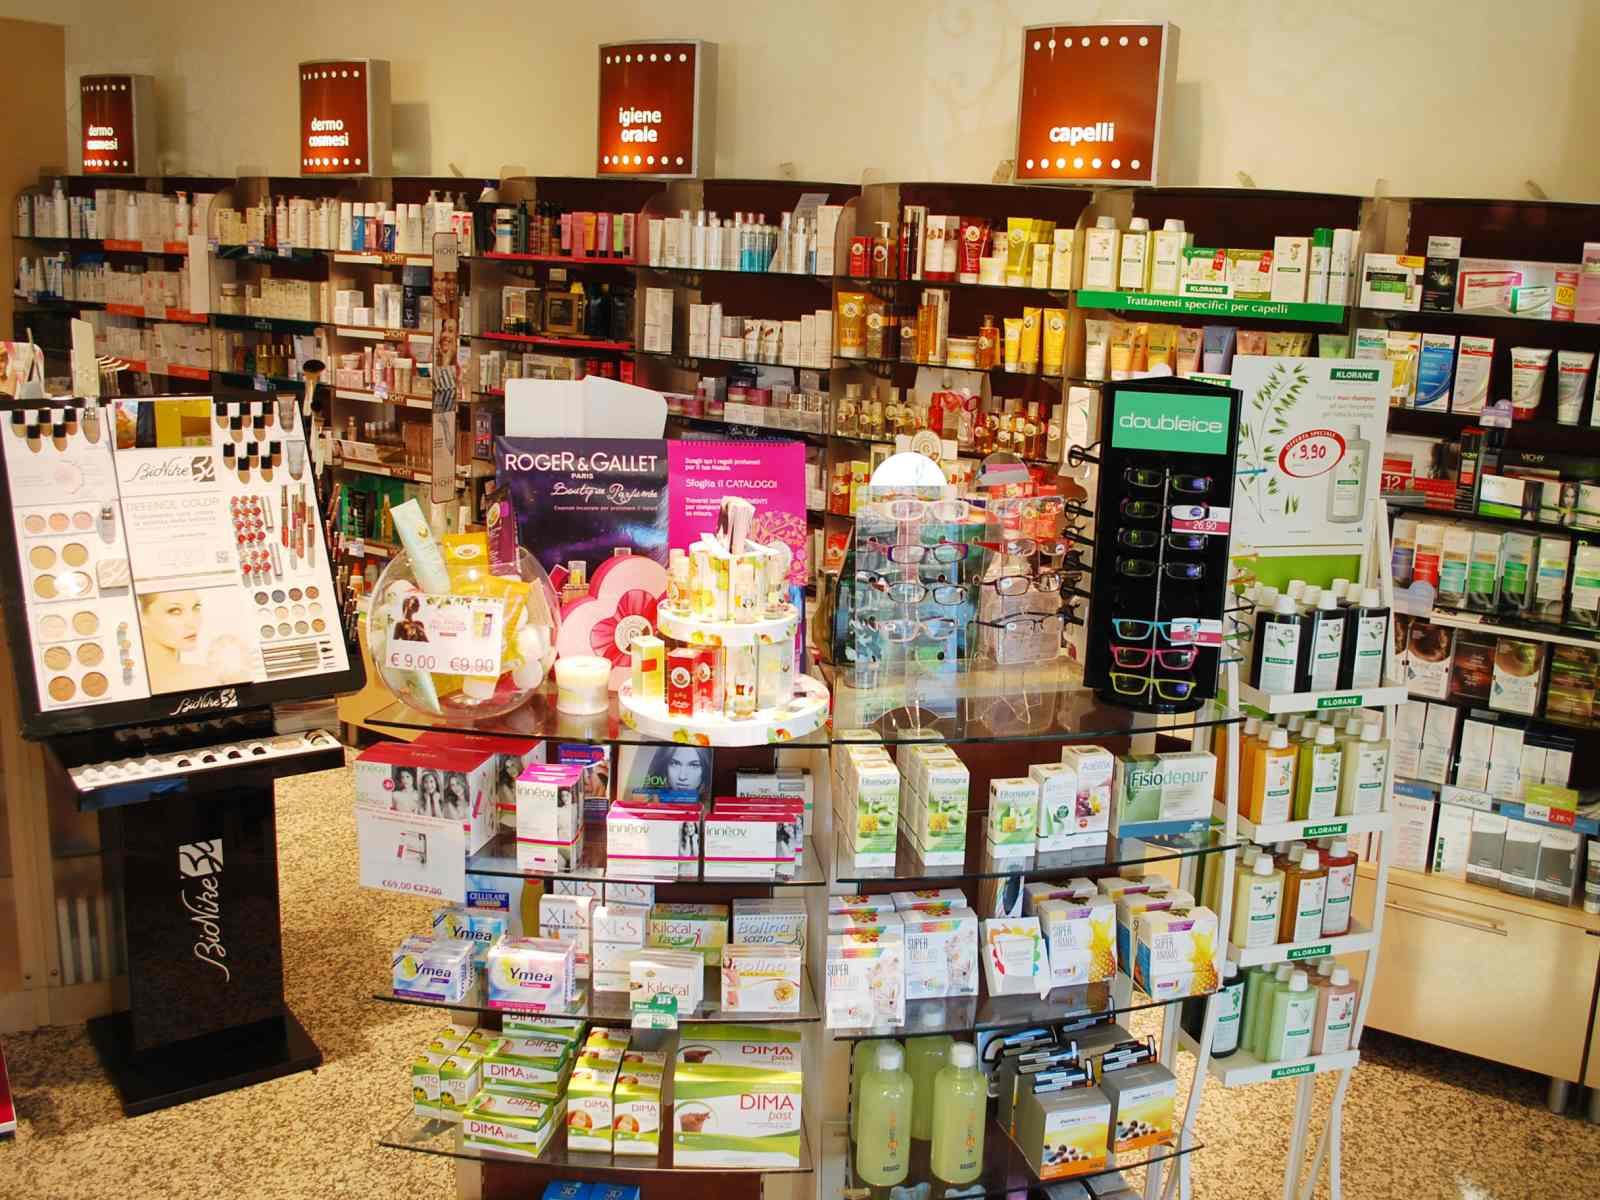 vendita-medicine-modena-montale-rangone-formigine